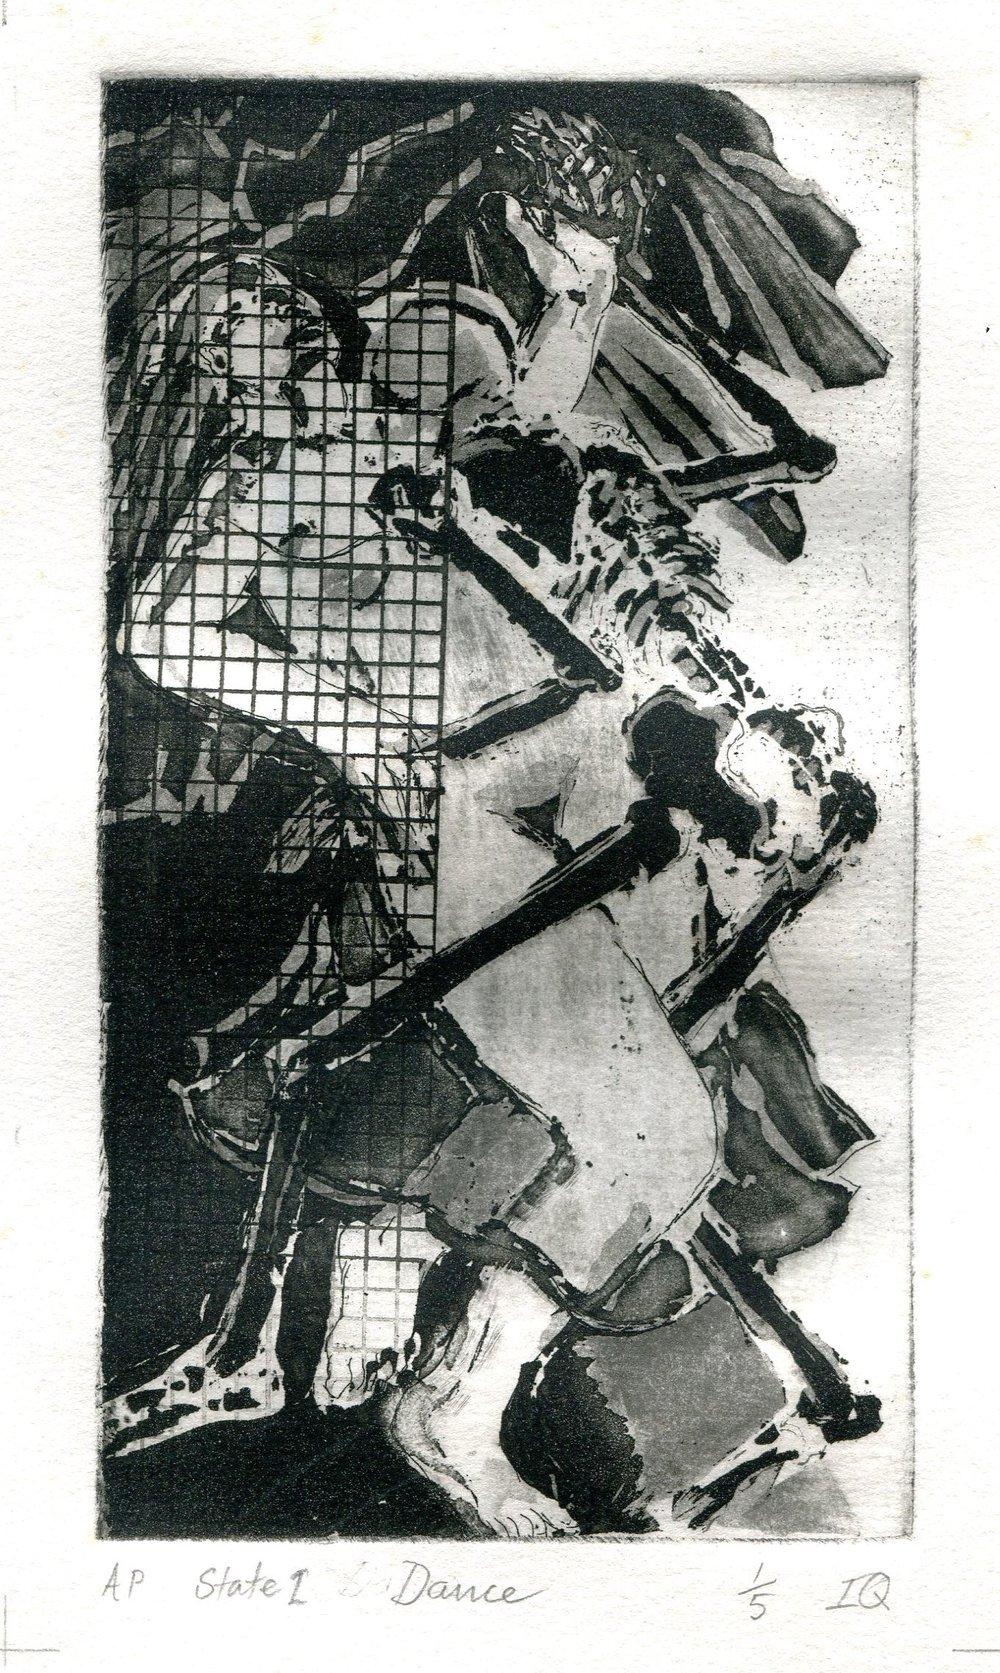 97a Isabella Quattrocchi, Dance,  Aquatint etching on paper